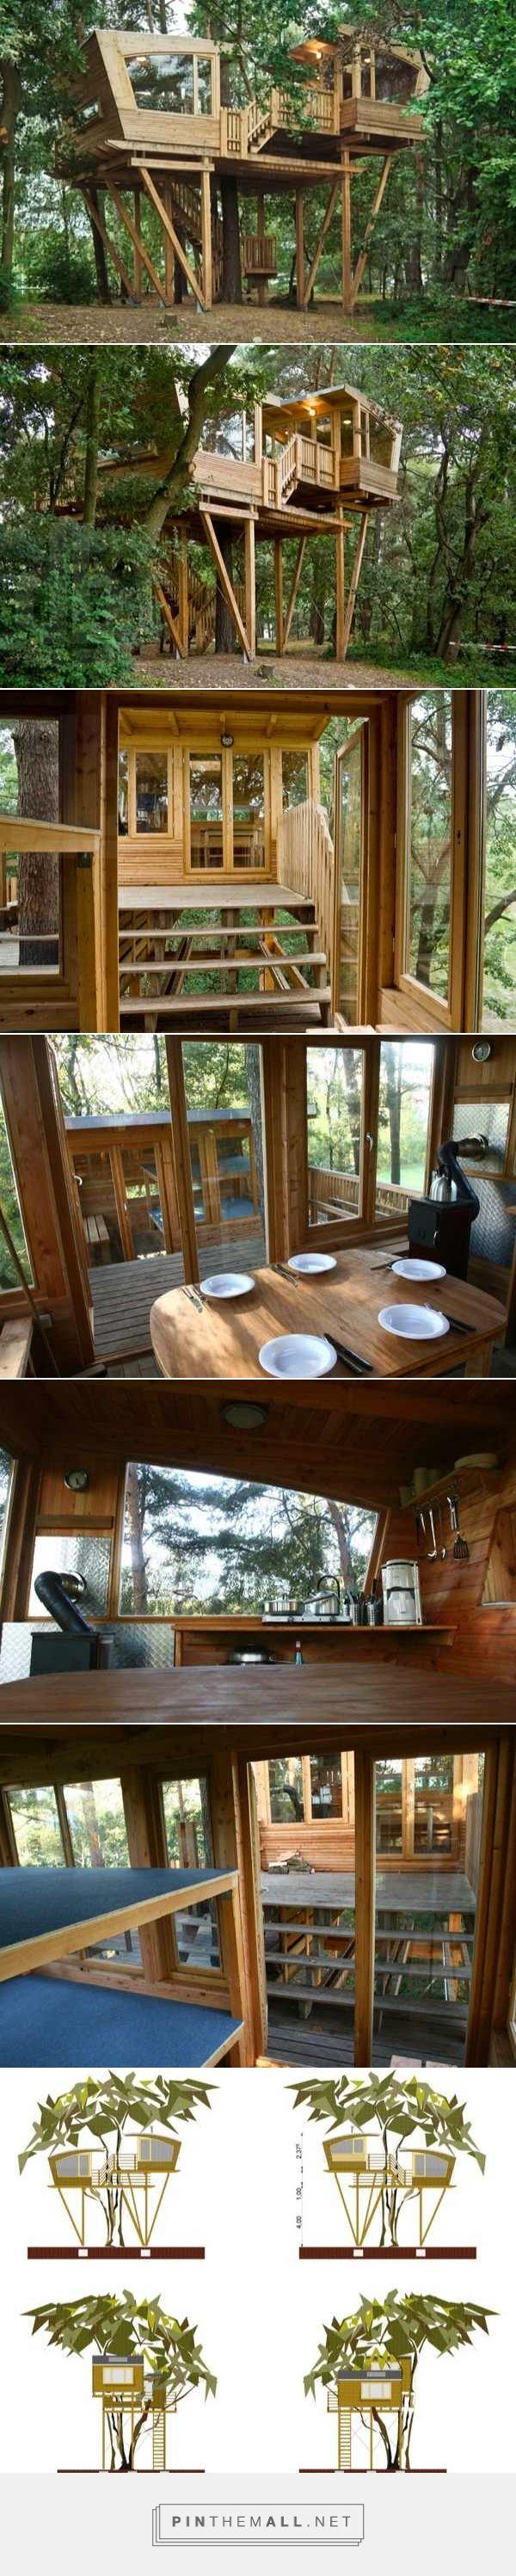 210 sq ft modern treehouse tiny home created via https